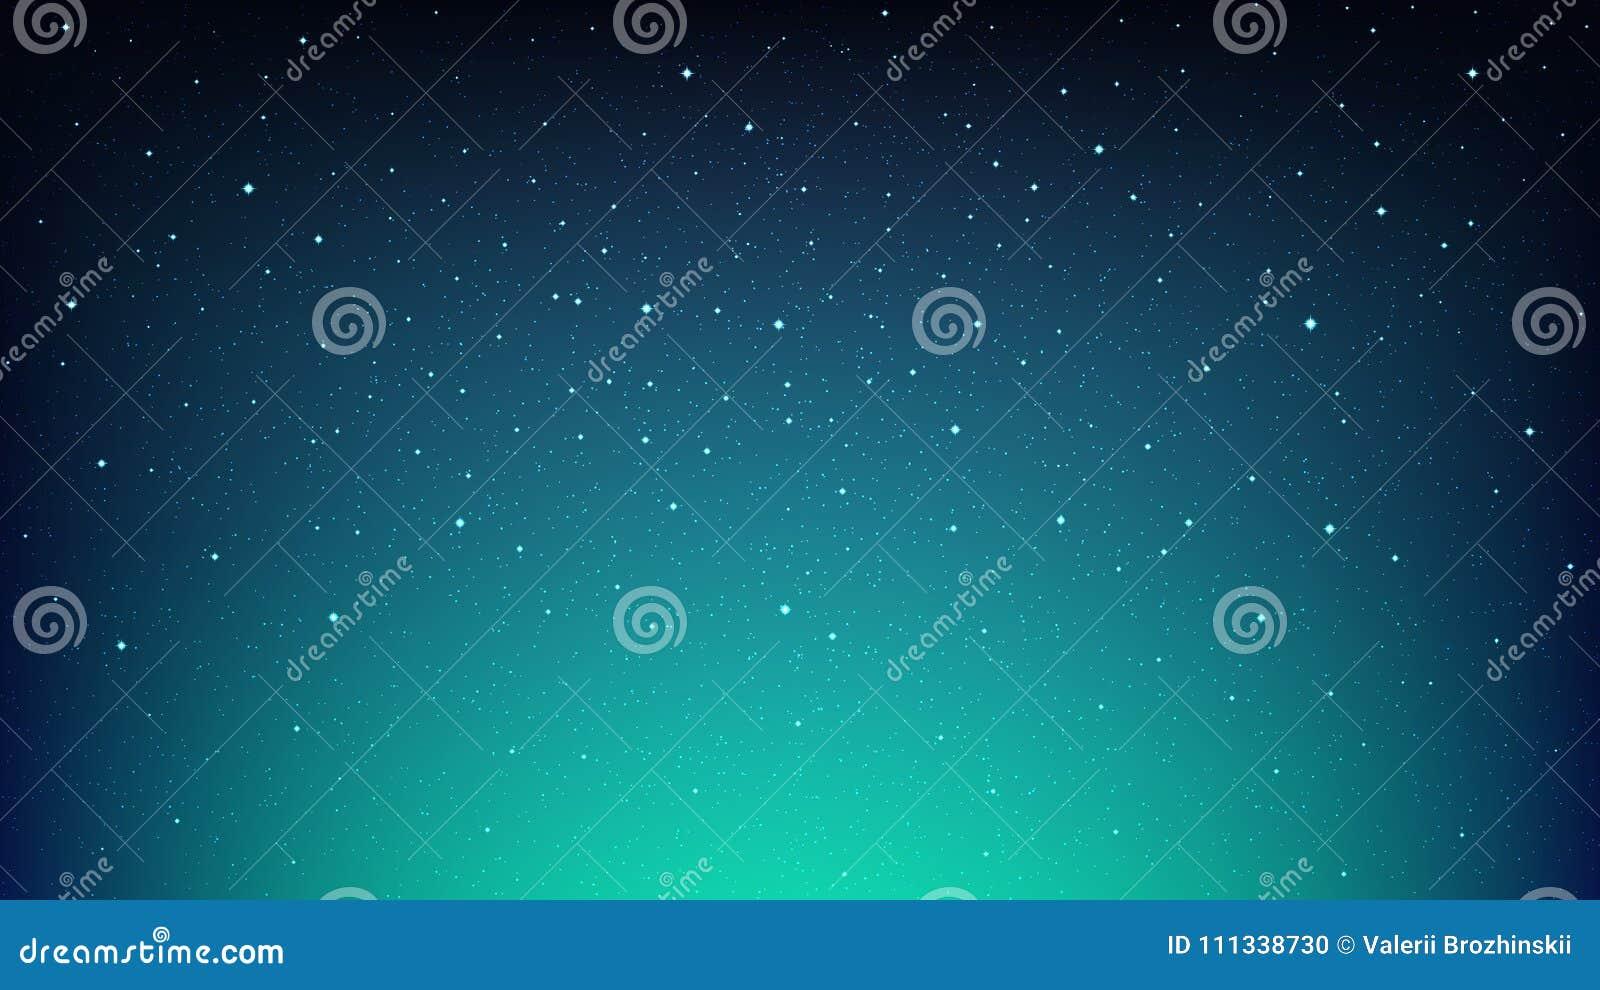 Nacht glanzende sterrige hemel, blauwe ruimteachtergrond met sterren